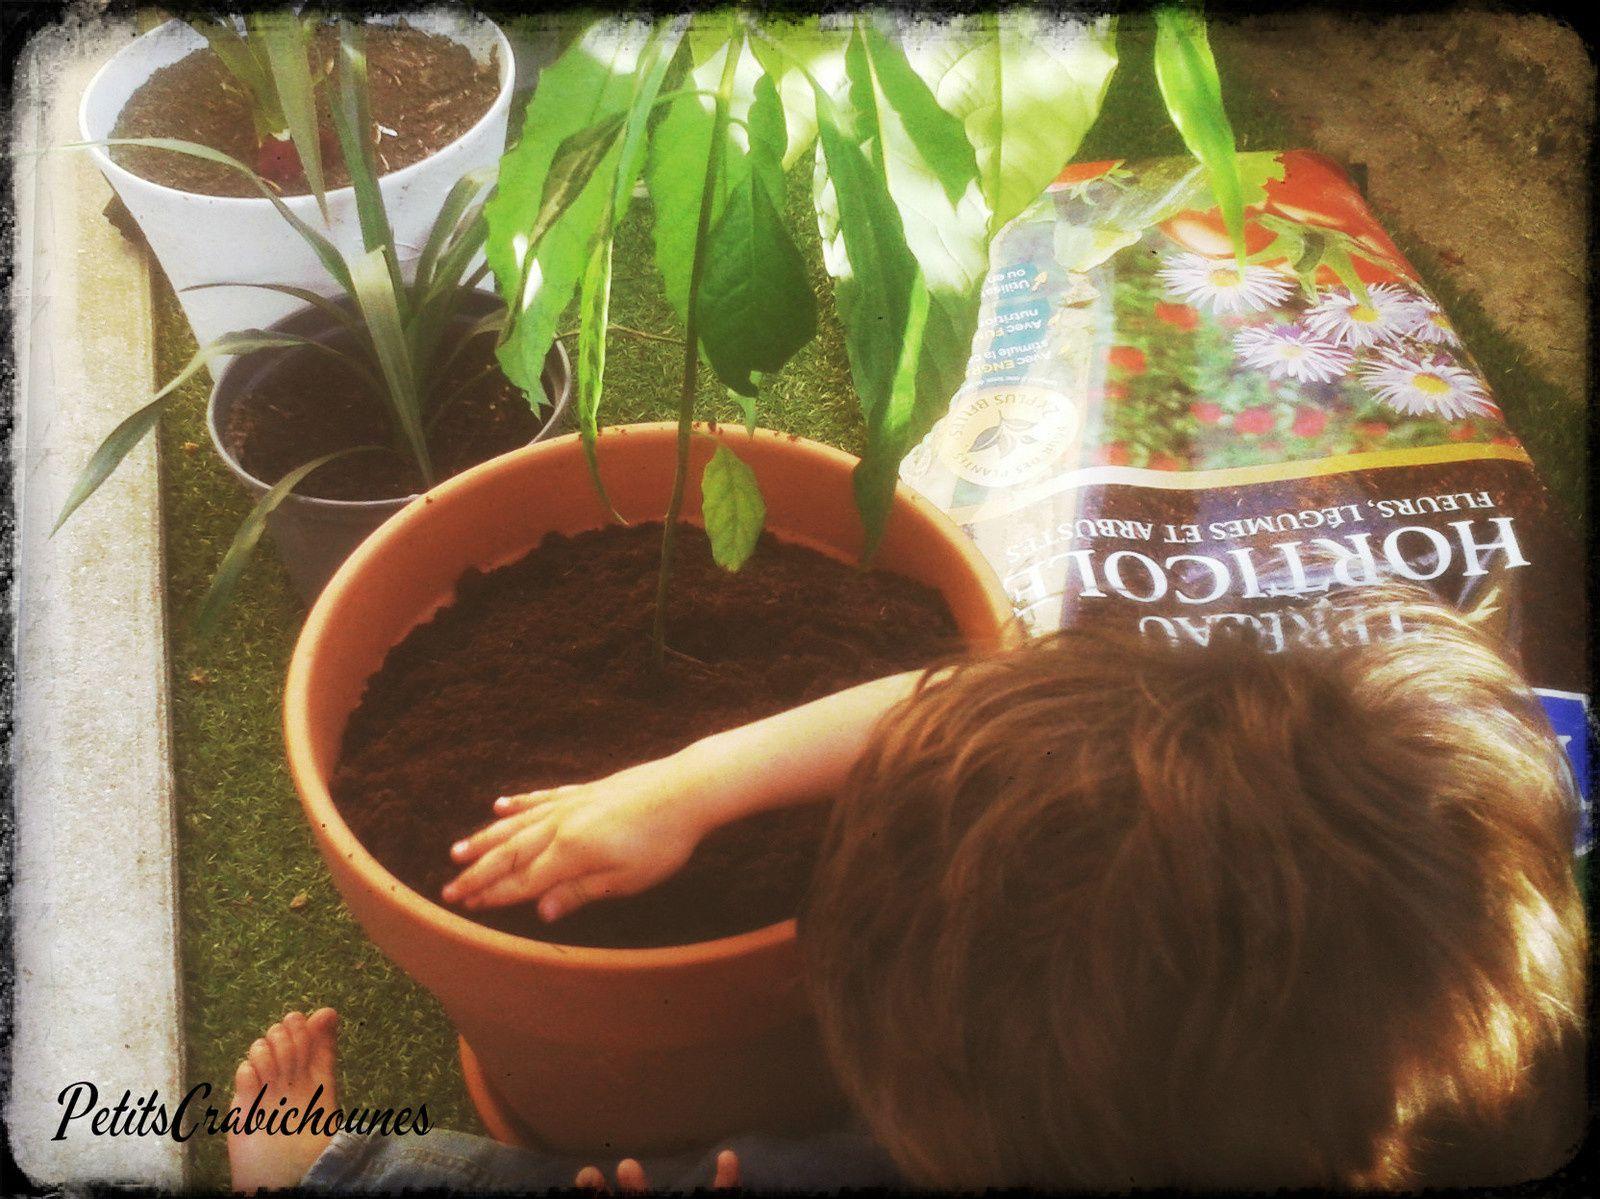 Jardinage : Replanter notre avocat.